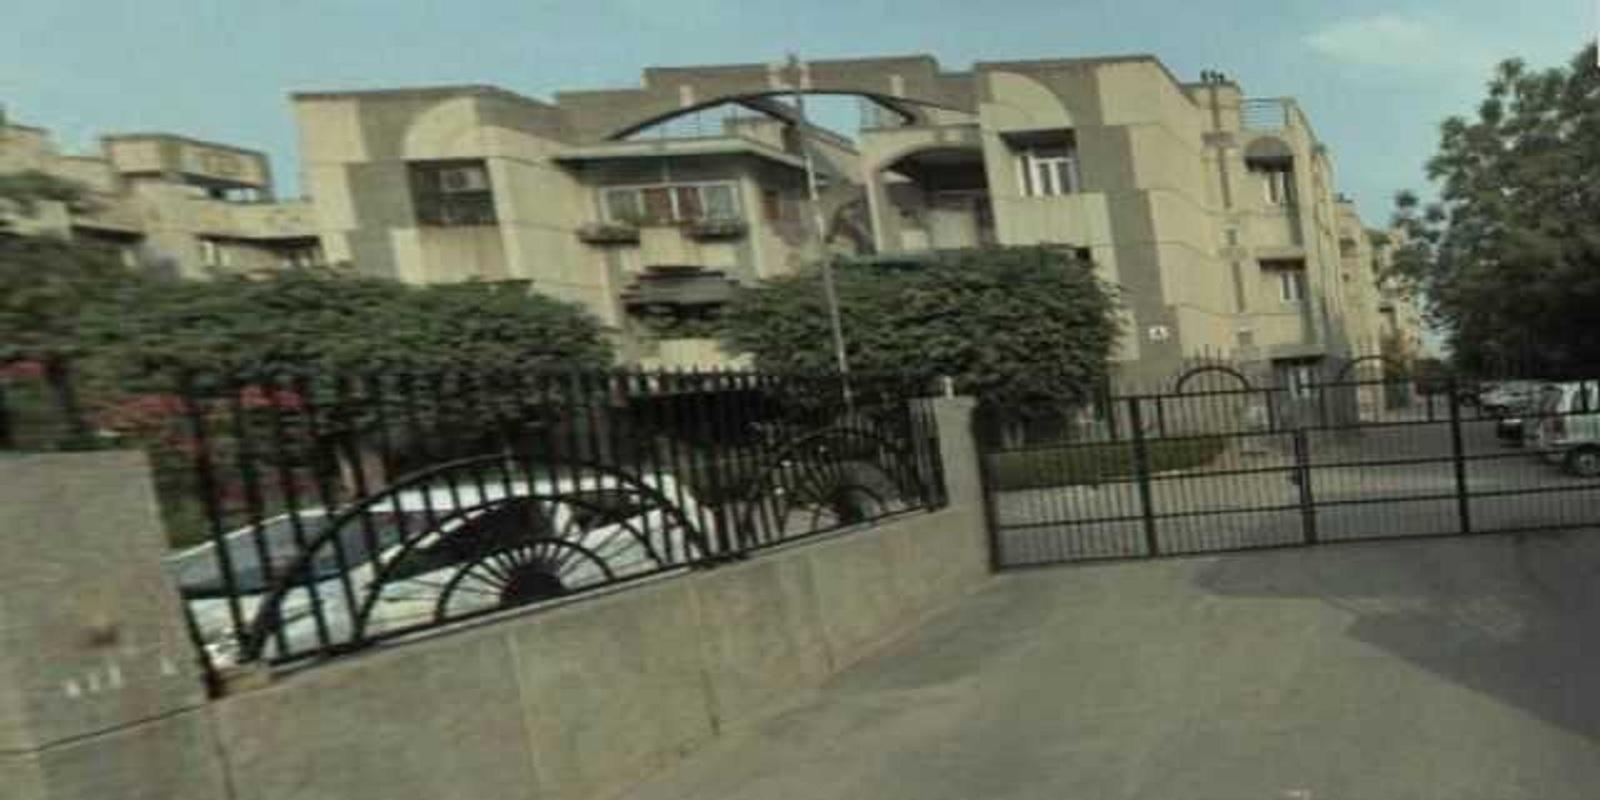 kaveri apartments dwarka project project large image1